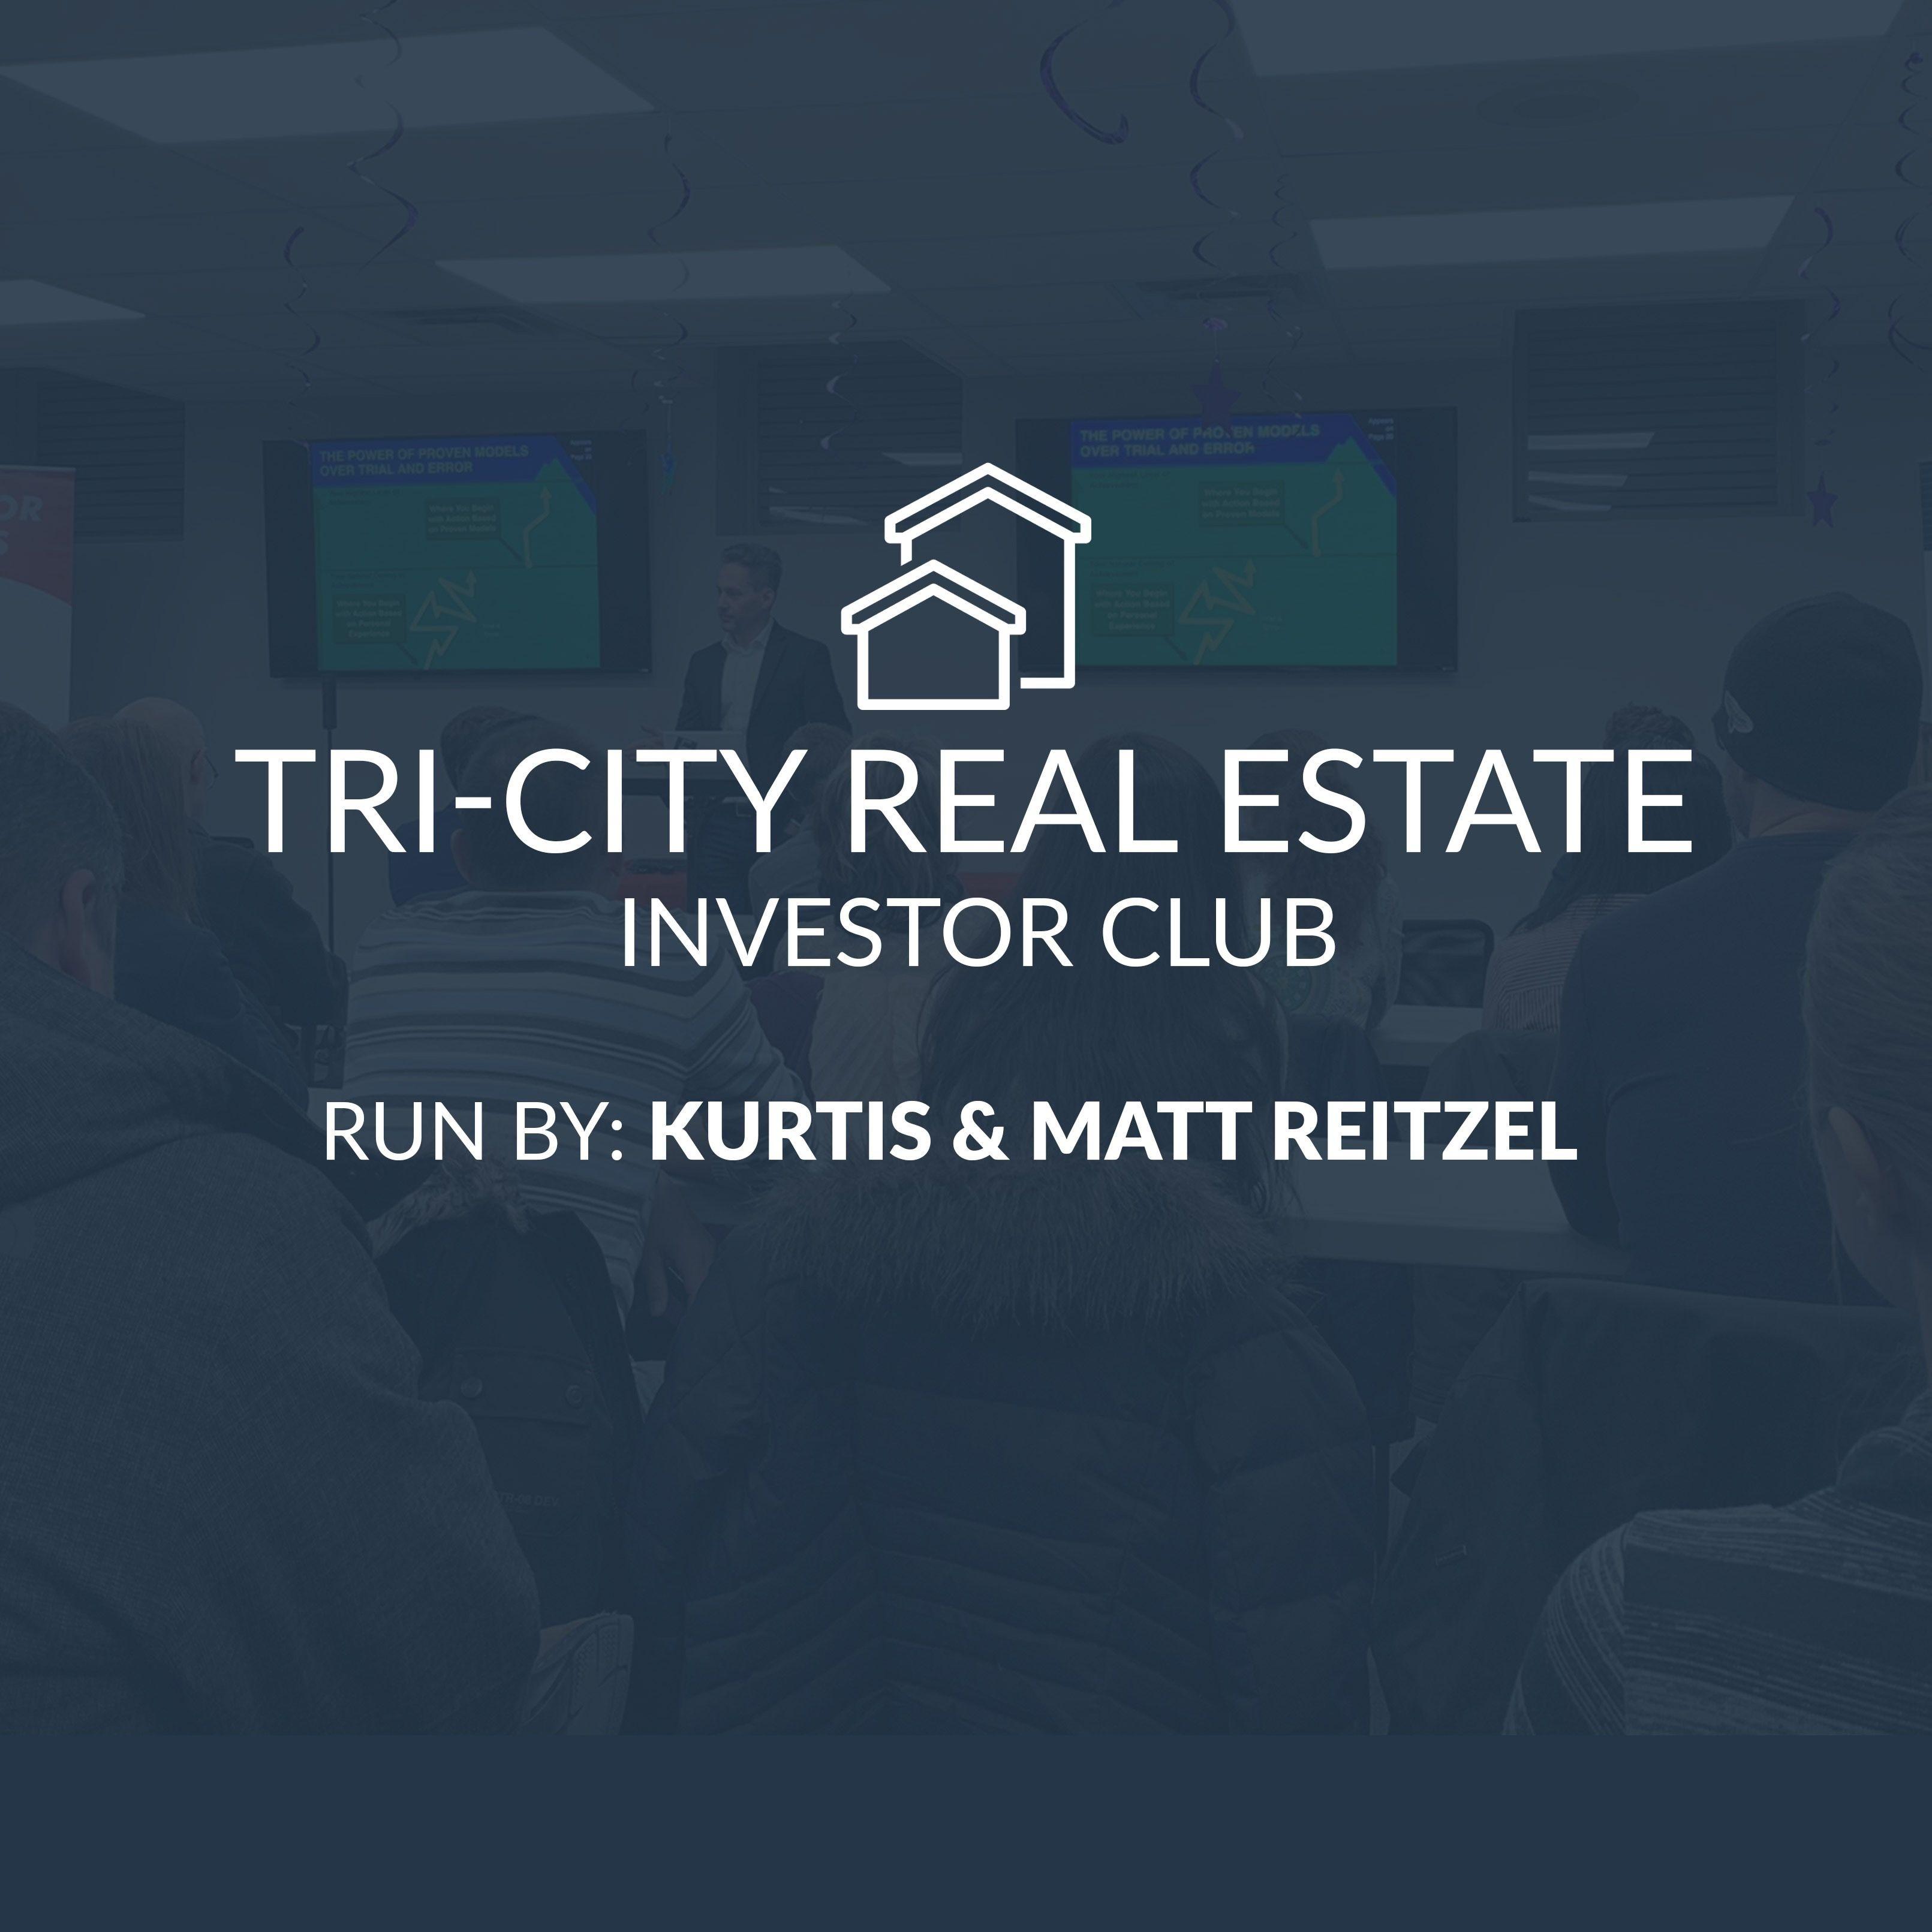 Tri-City Real Estate Investor Club